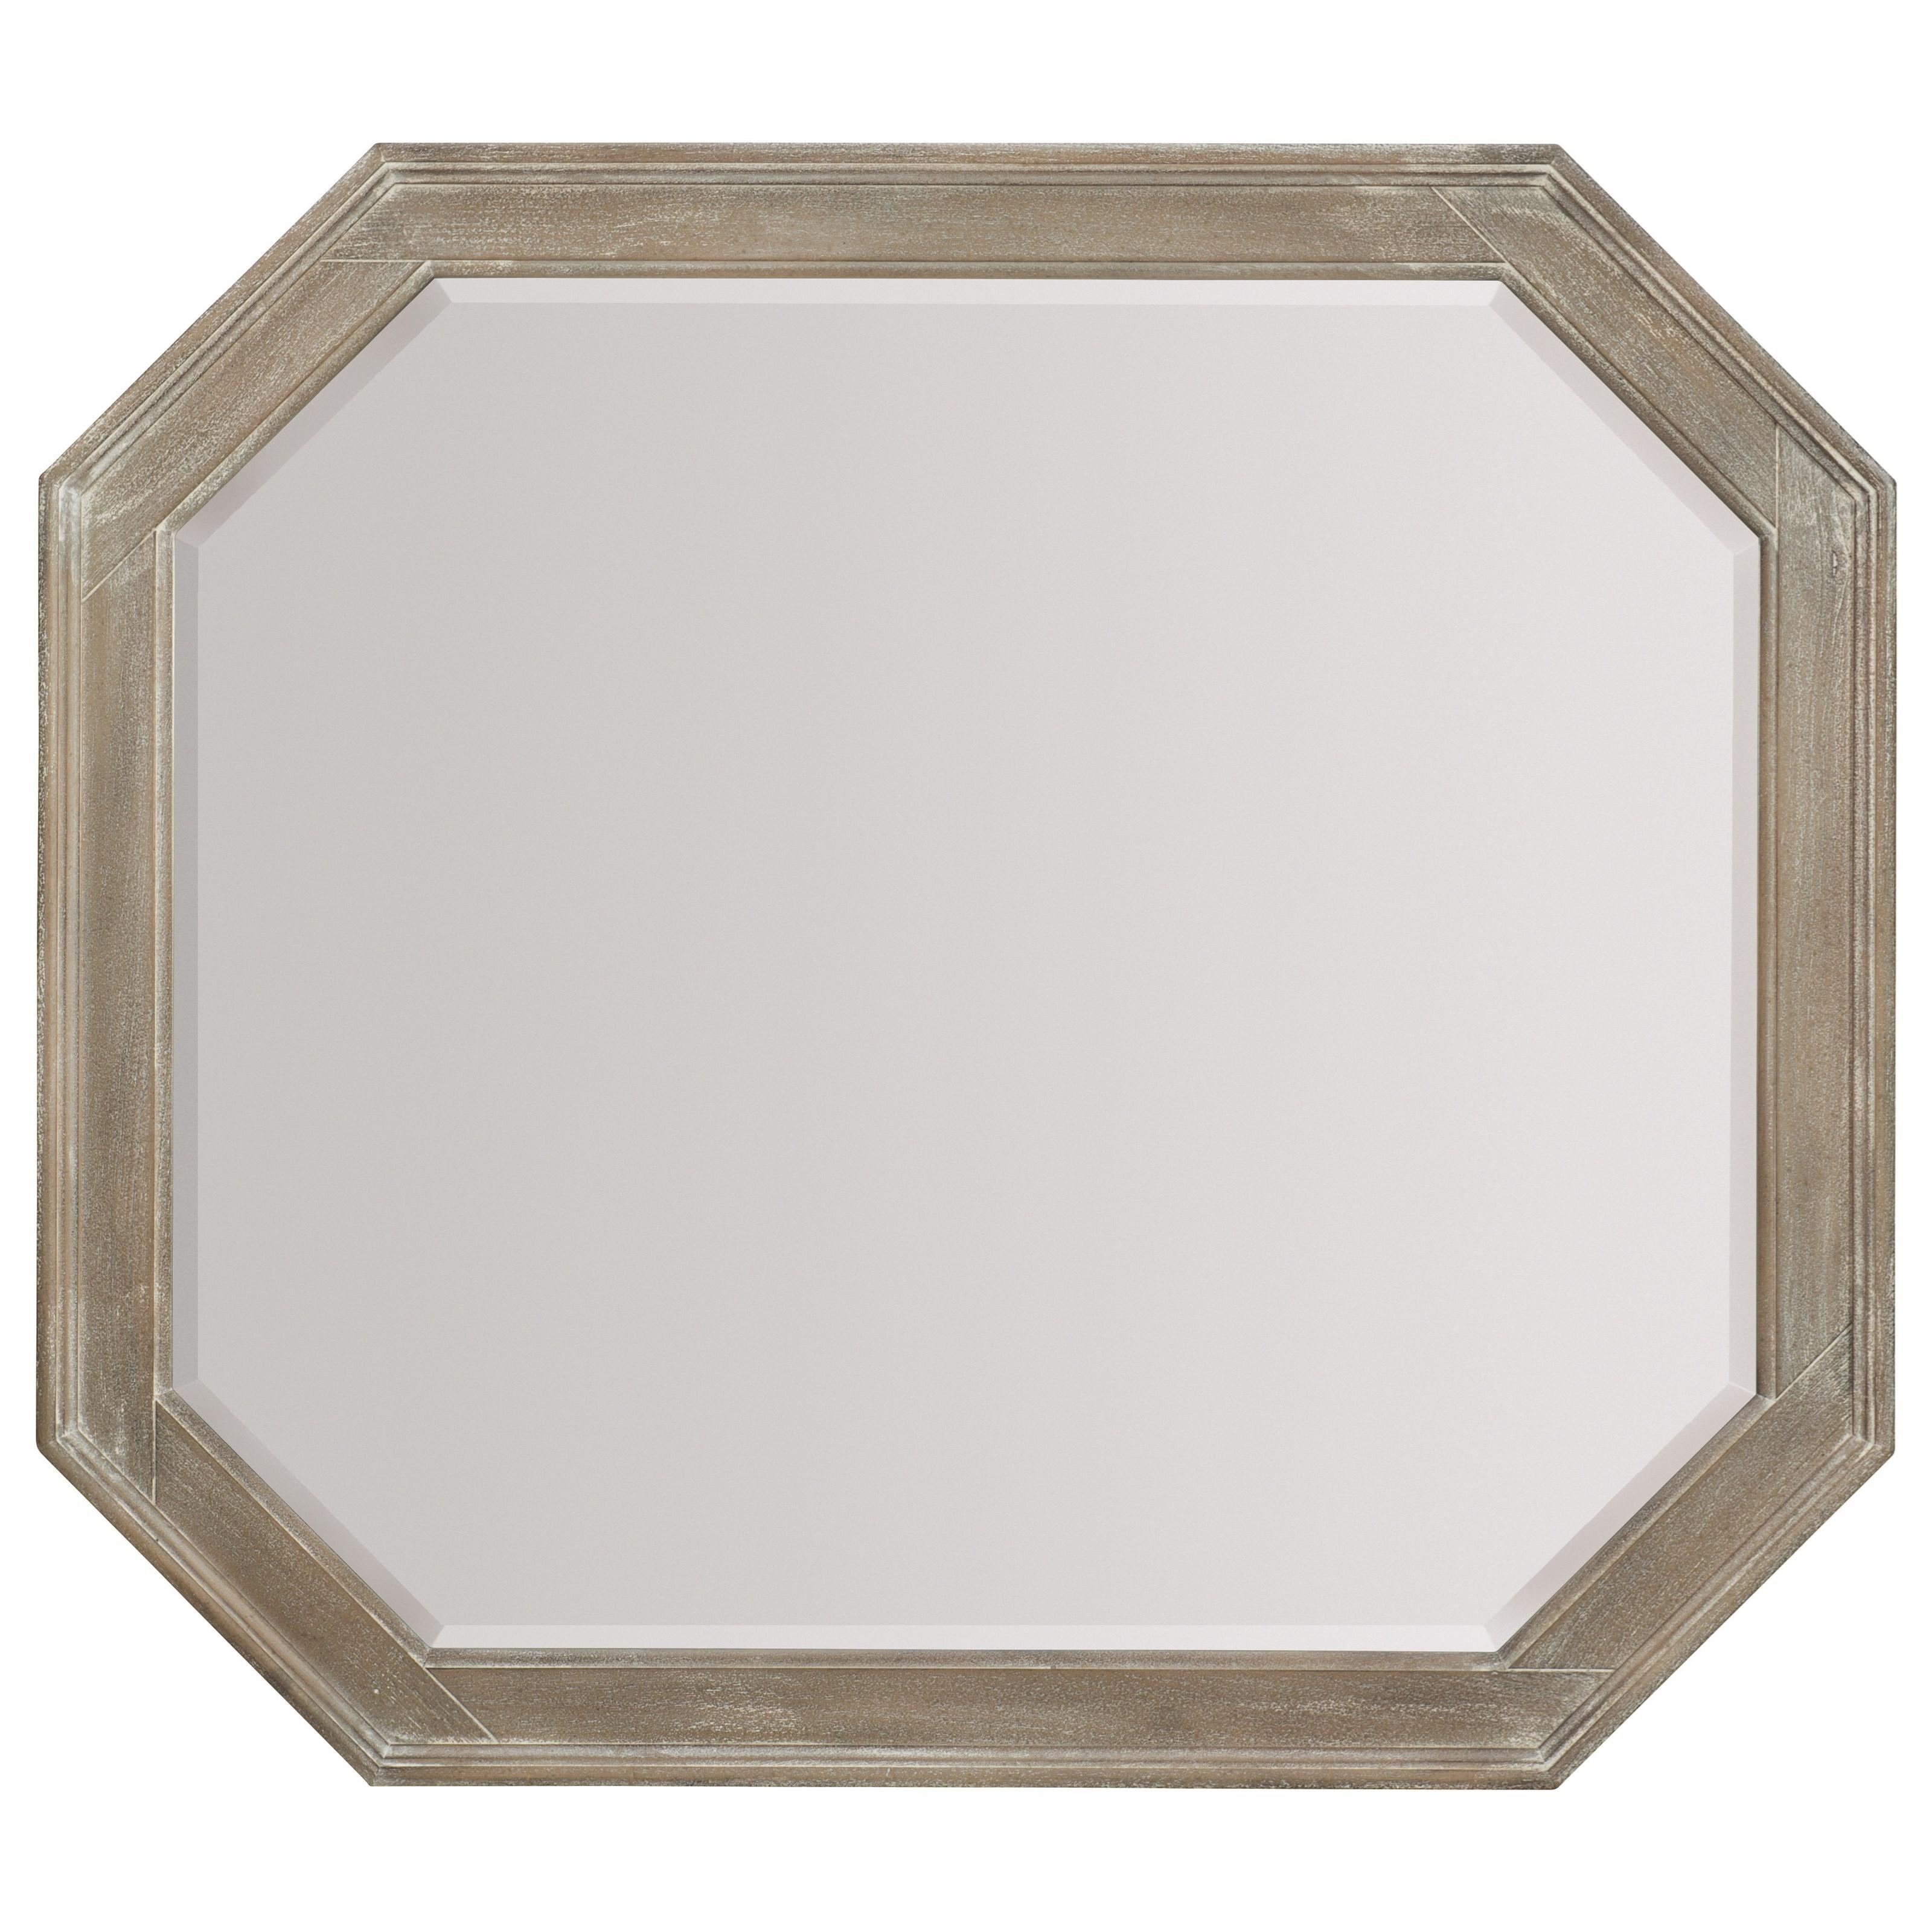 Hooker Furniture Pacifica Octagonal Mirror - Item Number: 6075-90007-LTWD